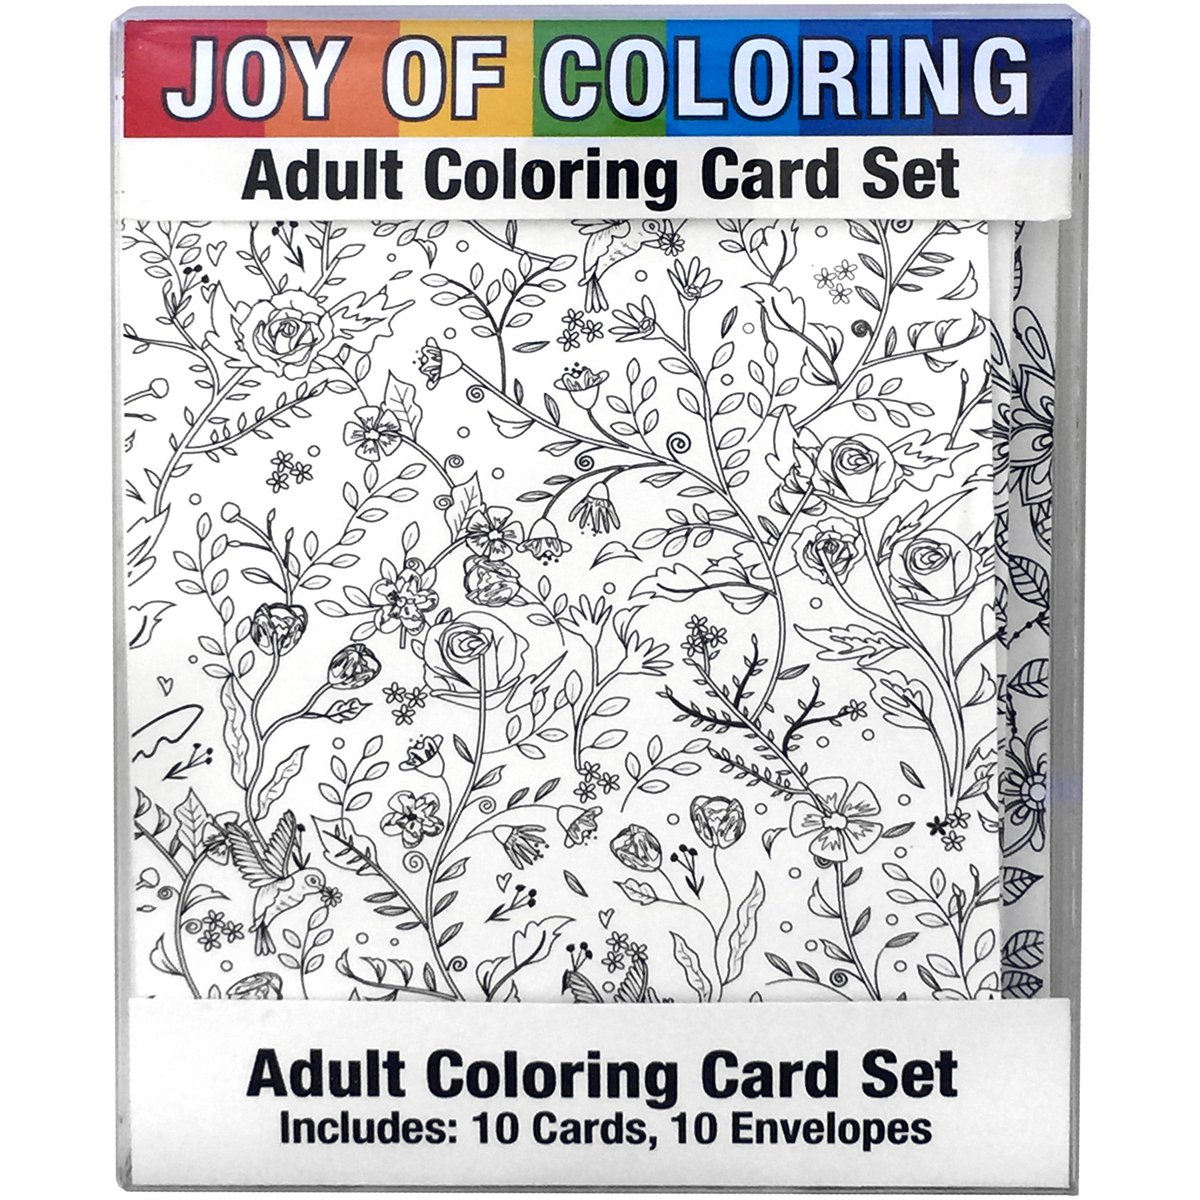 4 x 5.5 4 x 5.5 Zorbitz Inc Zorbitz 2663 Joy Adult Coloring Card Set